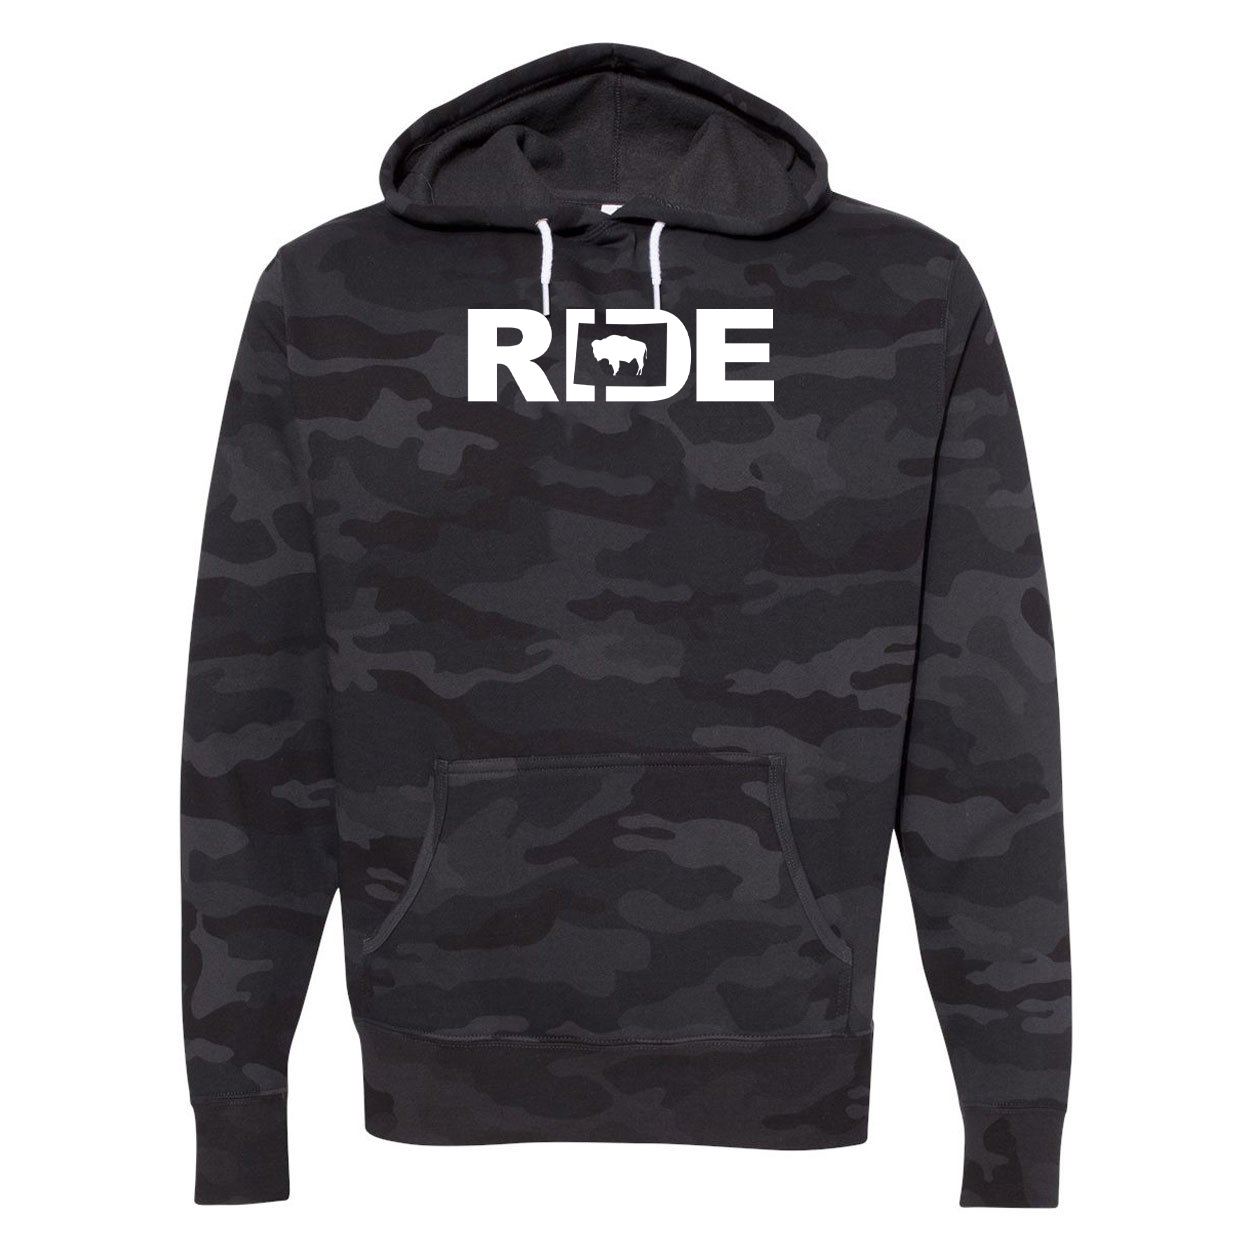 Ride Wyoming Classic Unisex Hooded Sweatshirt Black Camo (White Logo)